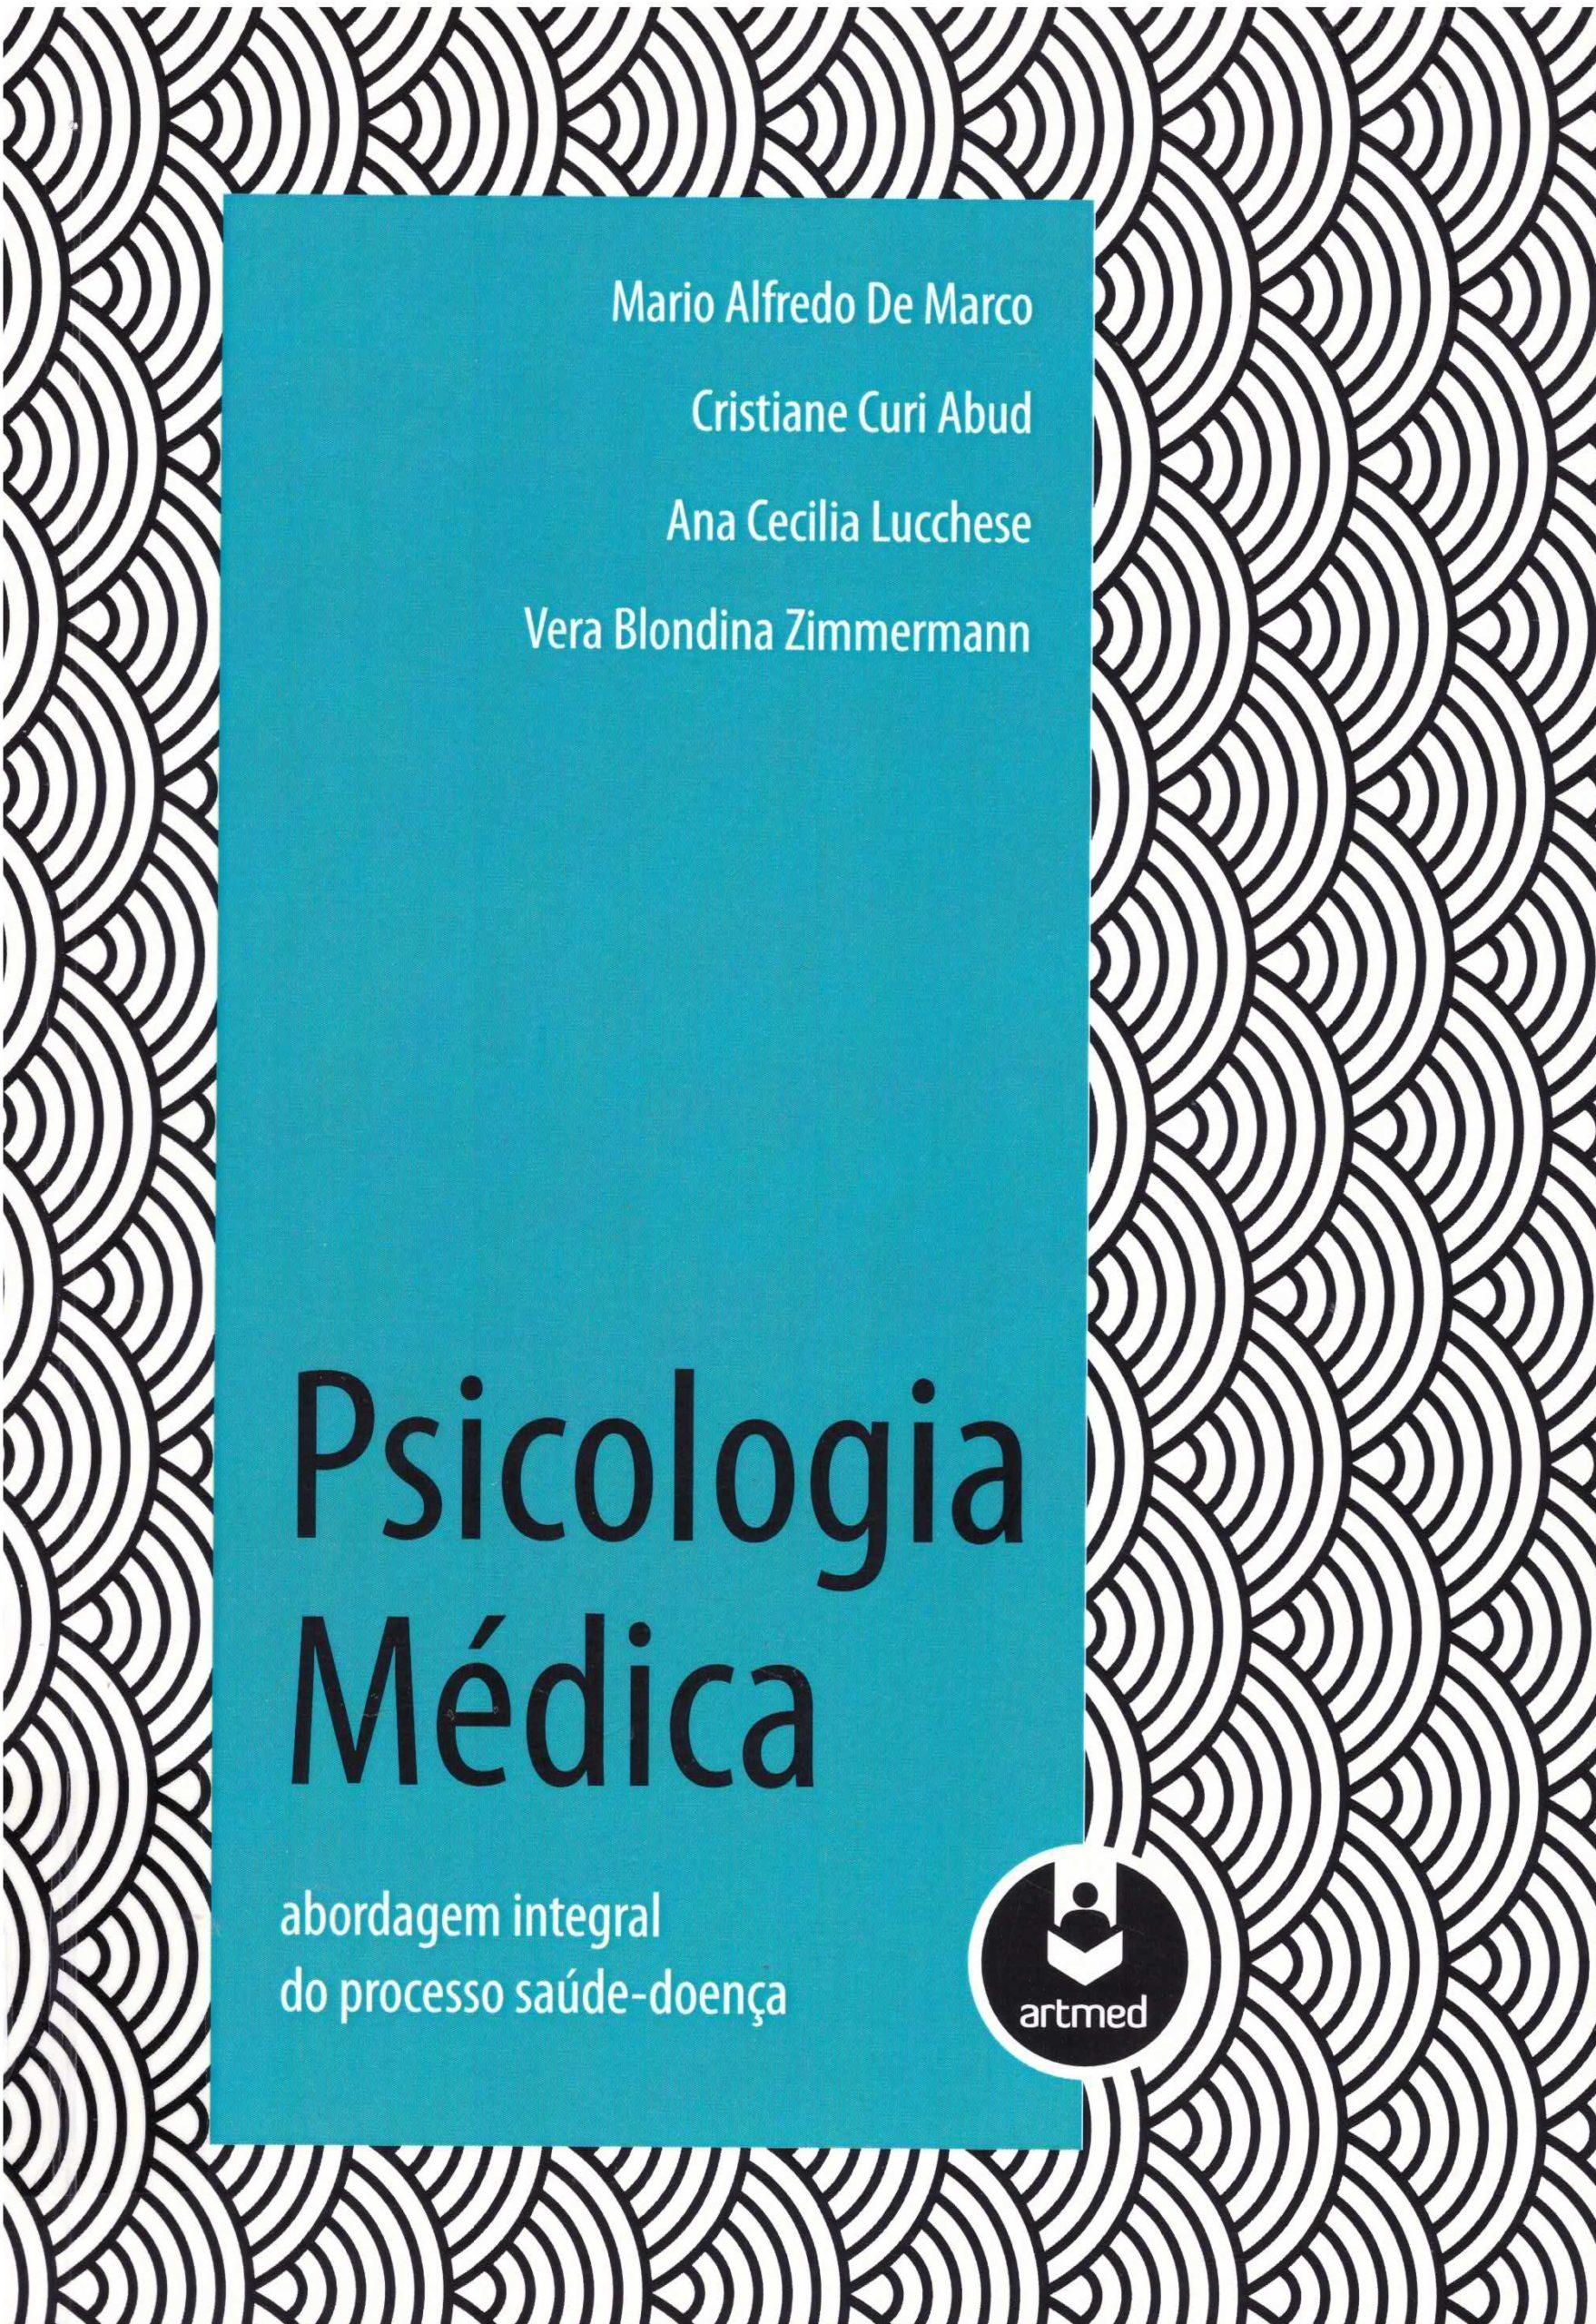 psicologia médica